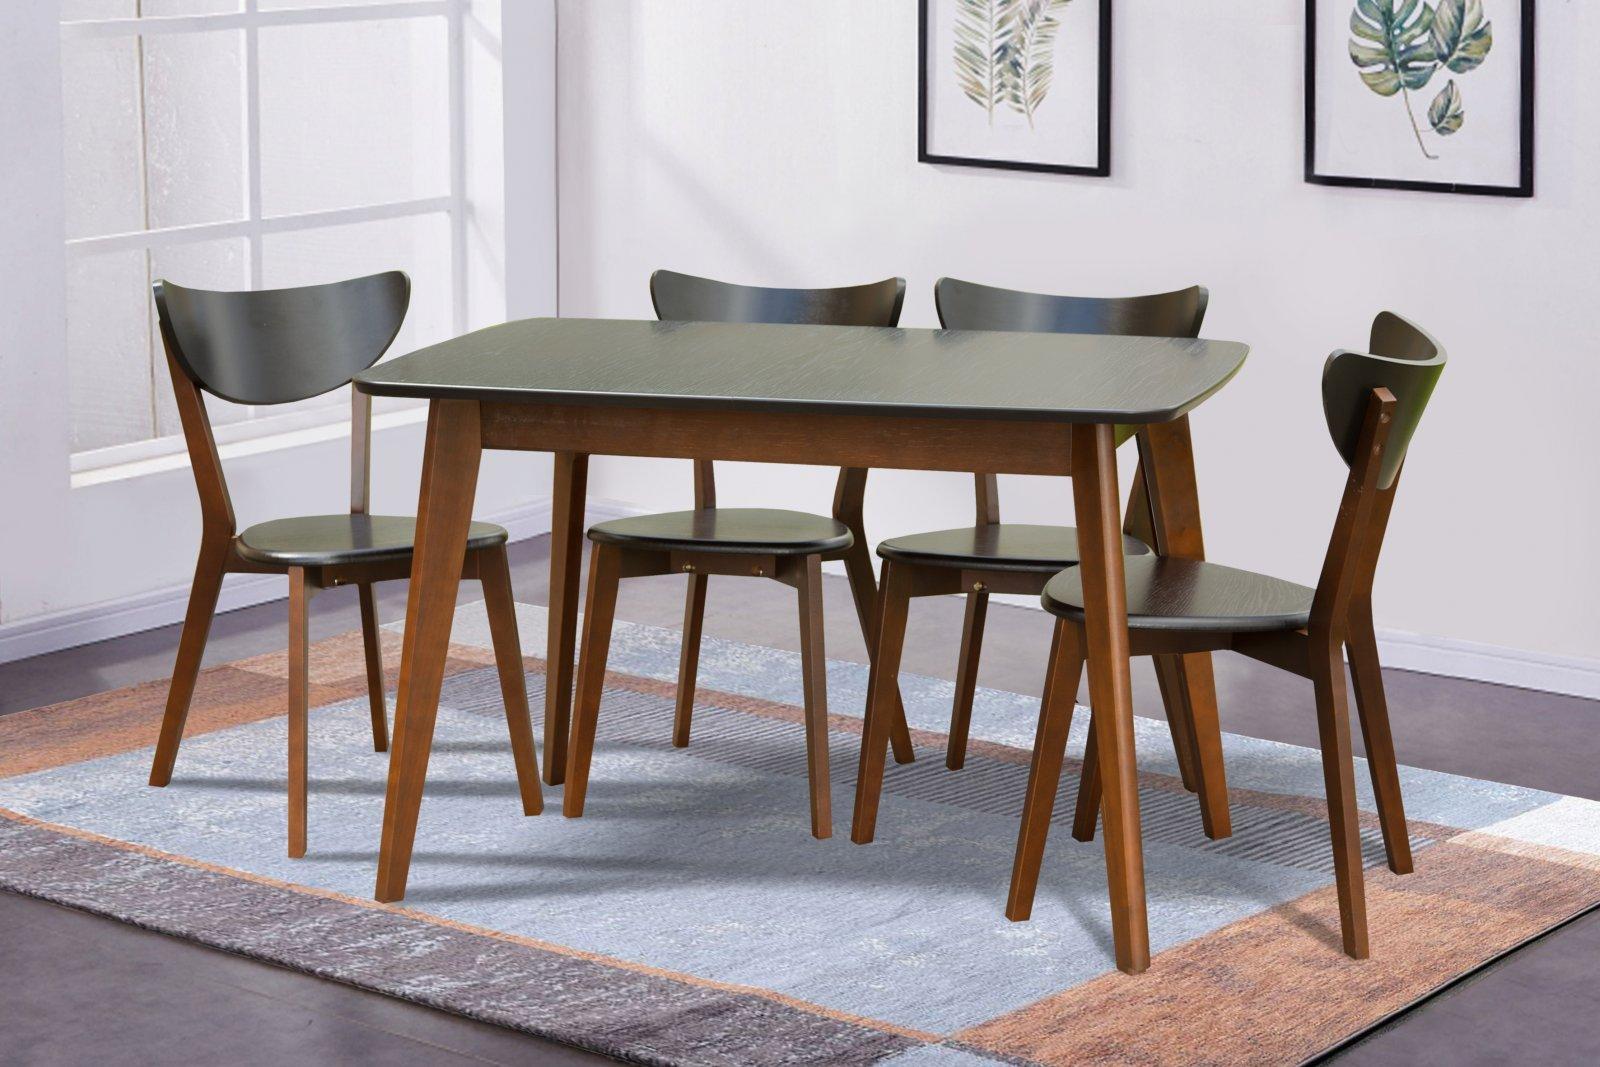 Фото - Стол для кухни деревянный Модерн